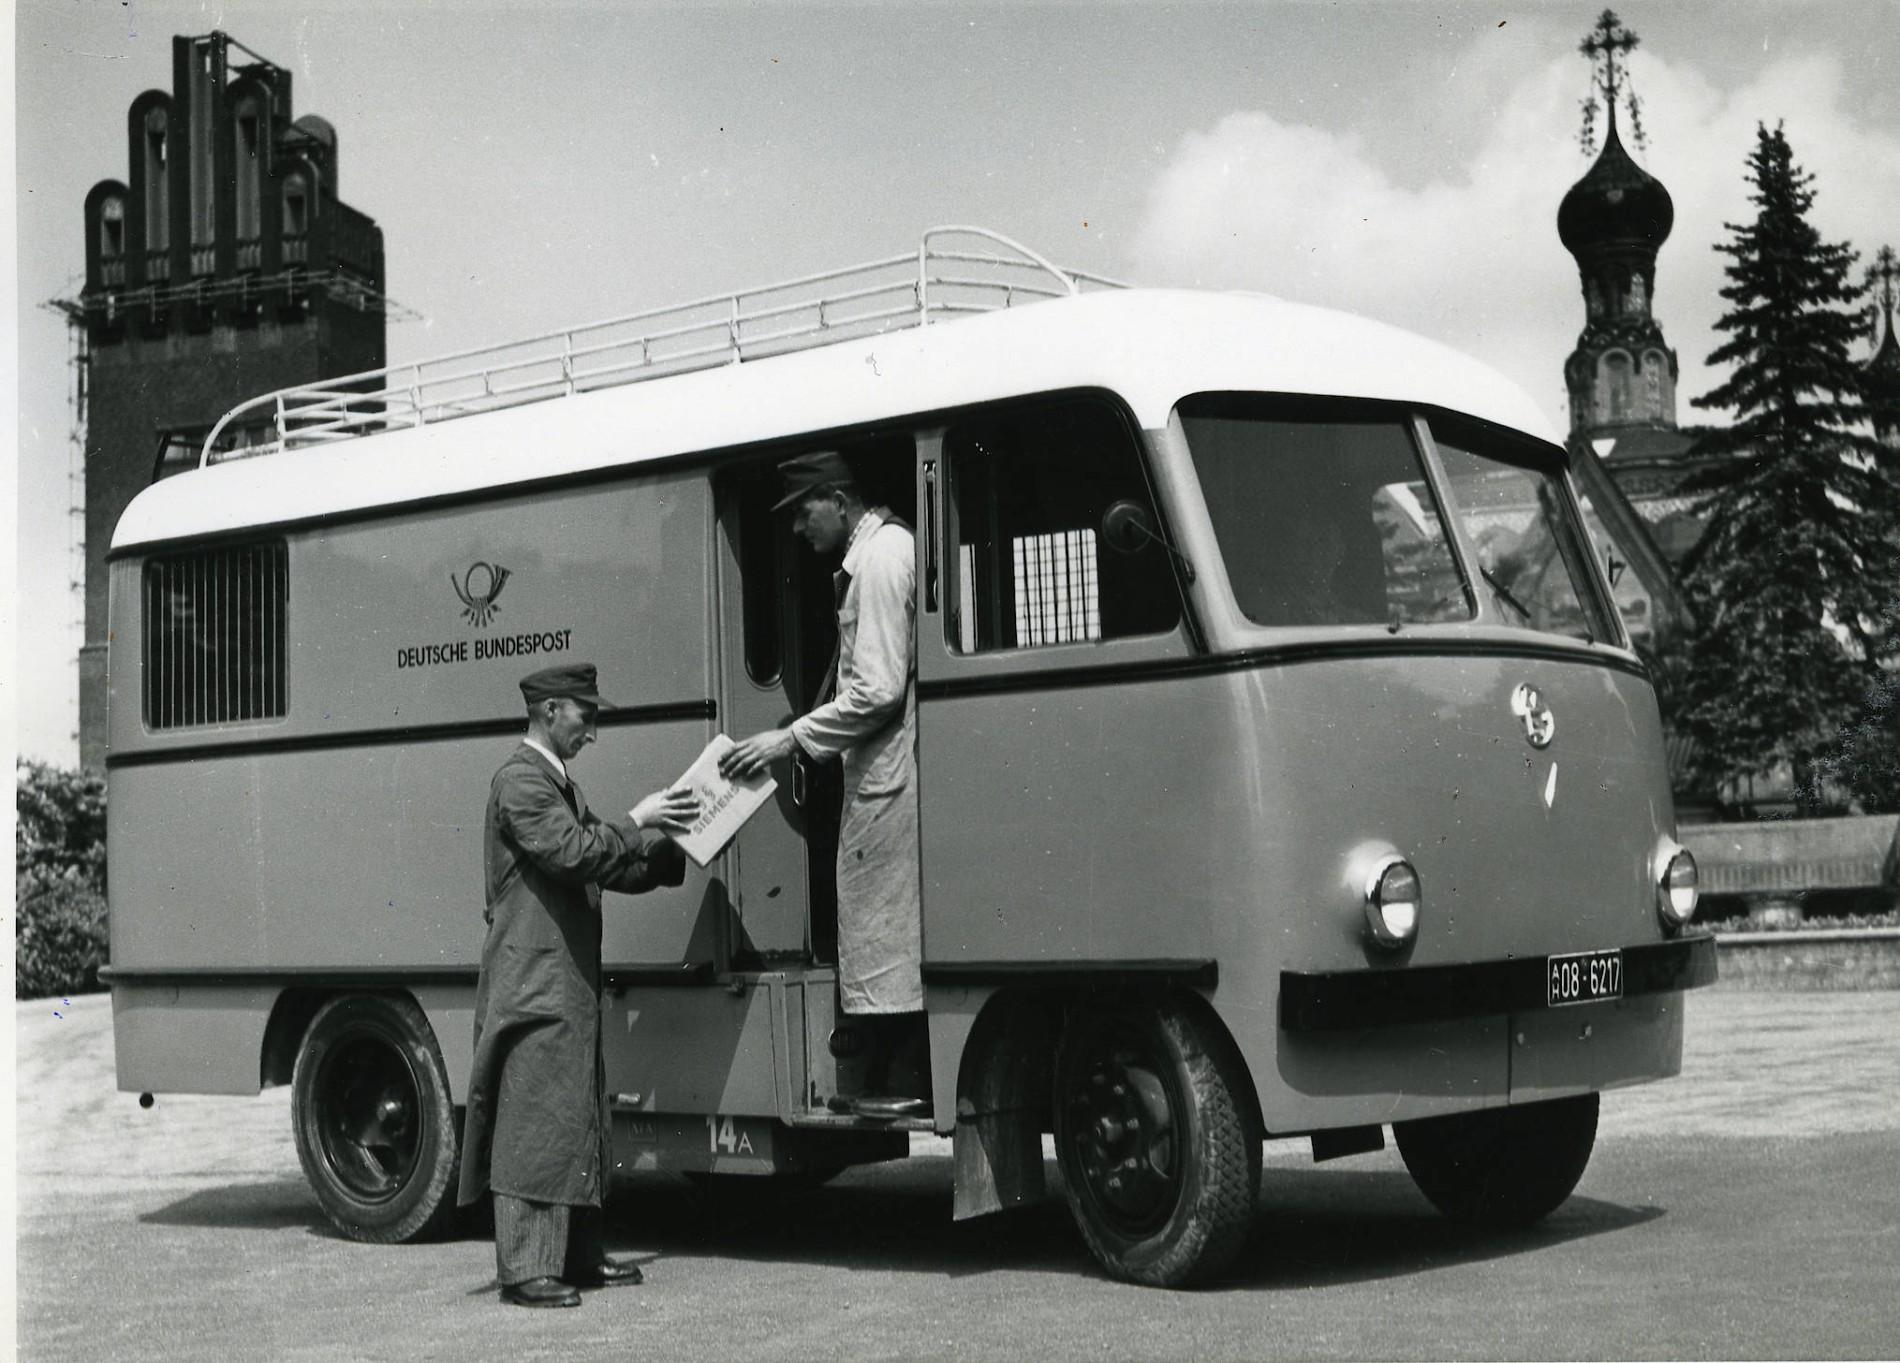 1955-Darmstadt-Deutsche-Bundespost-Elektrolastwagen-Maschinenfabrik-Esslingen-Paketpostwagen-EL-2500